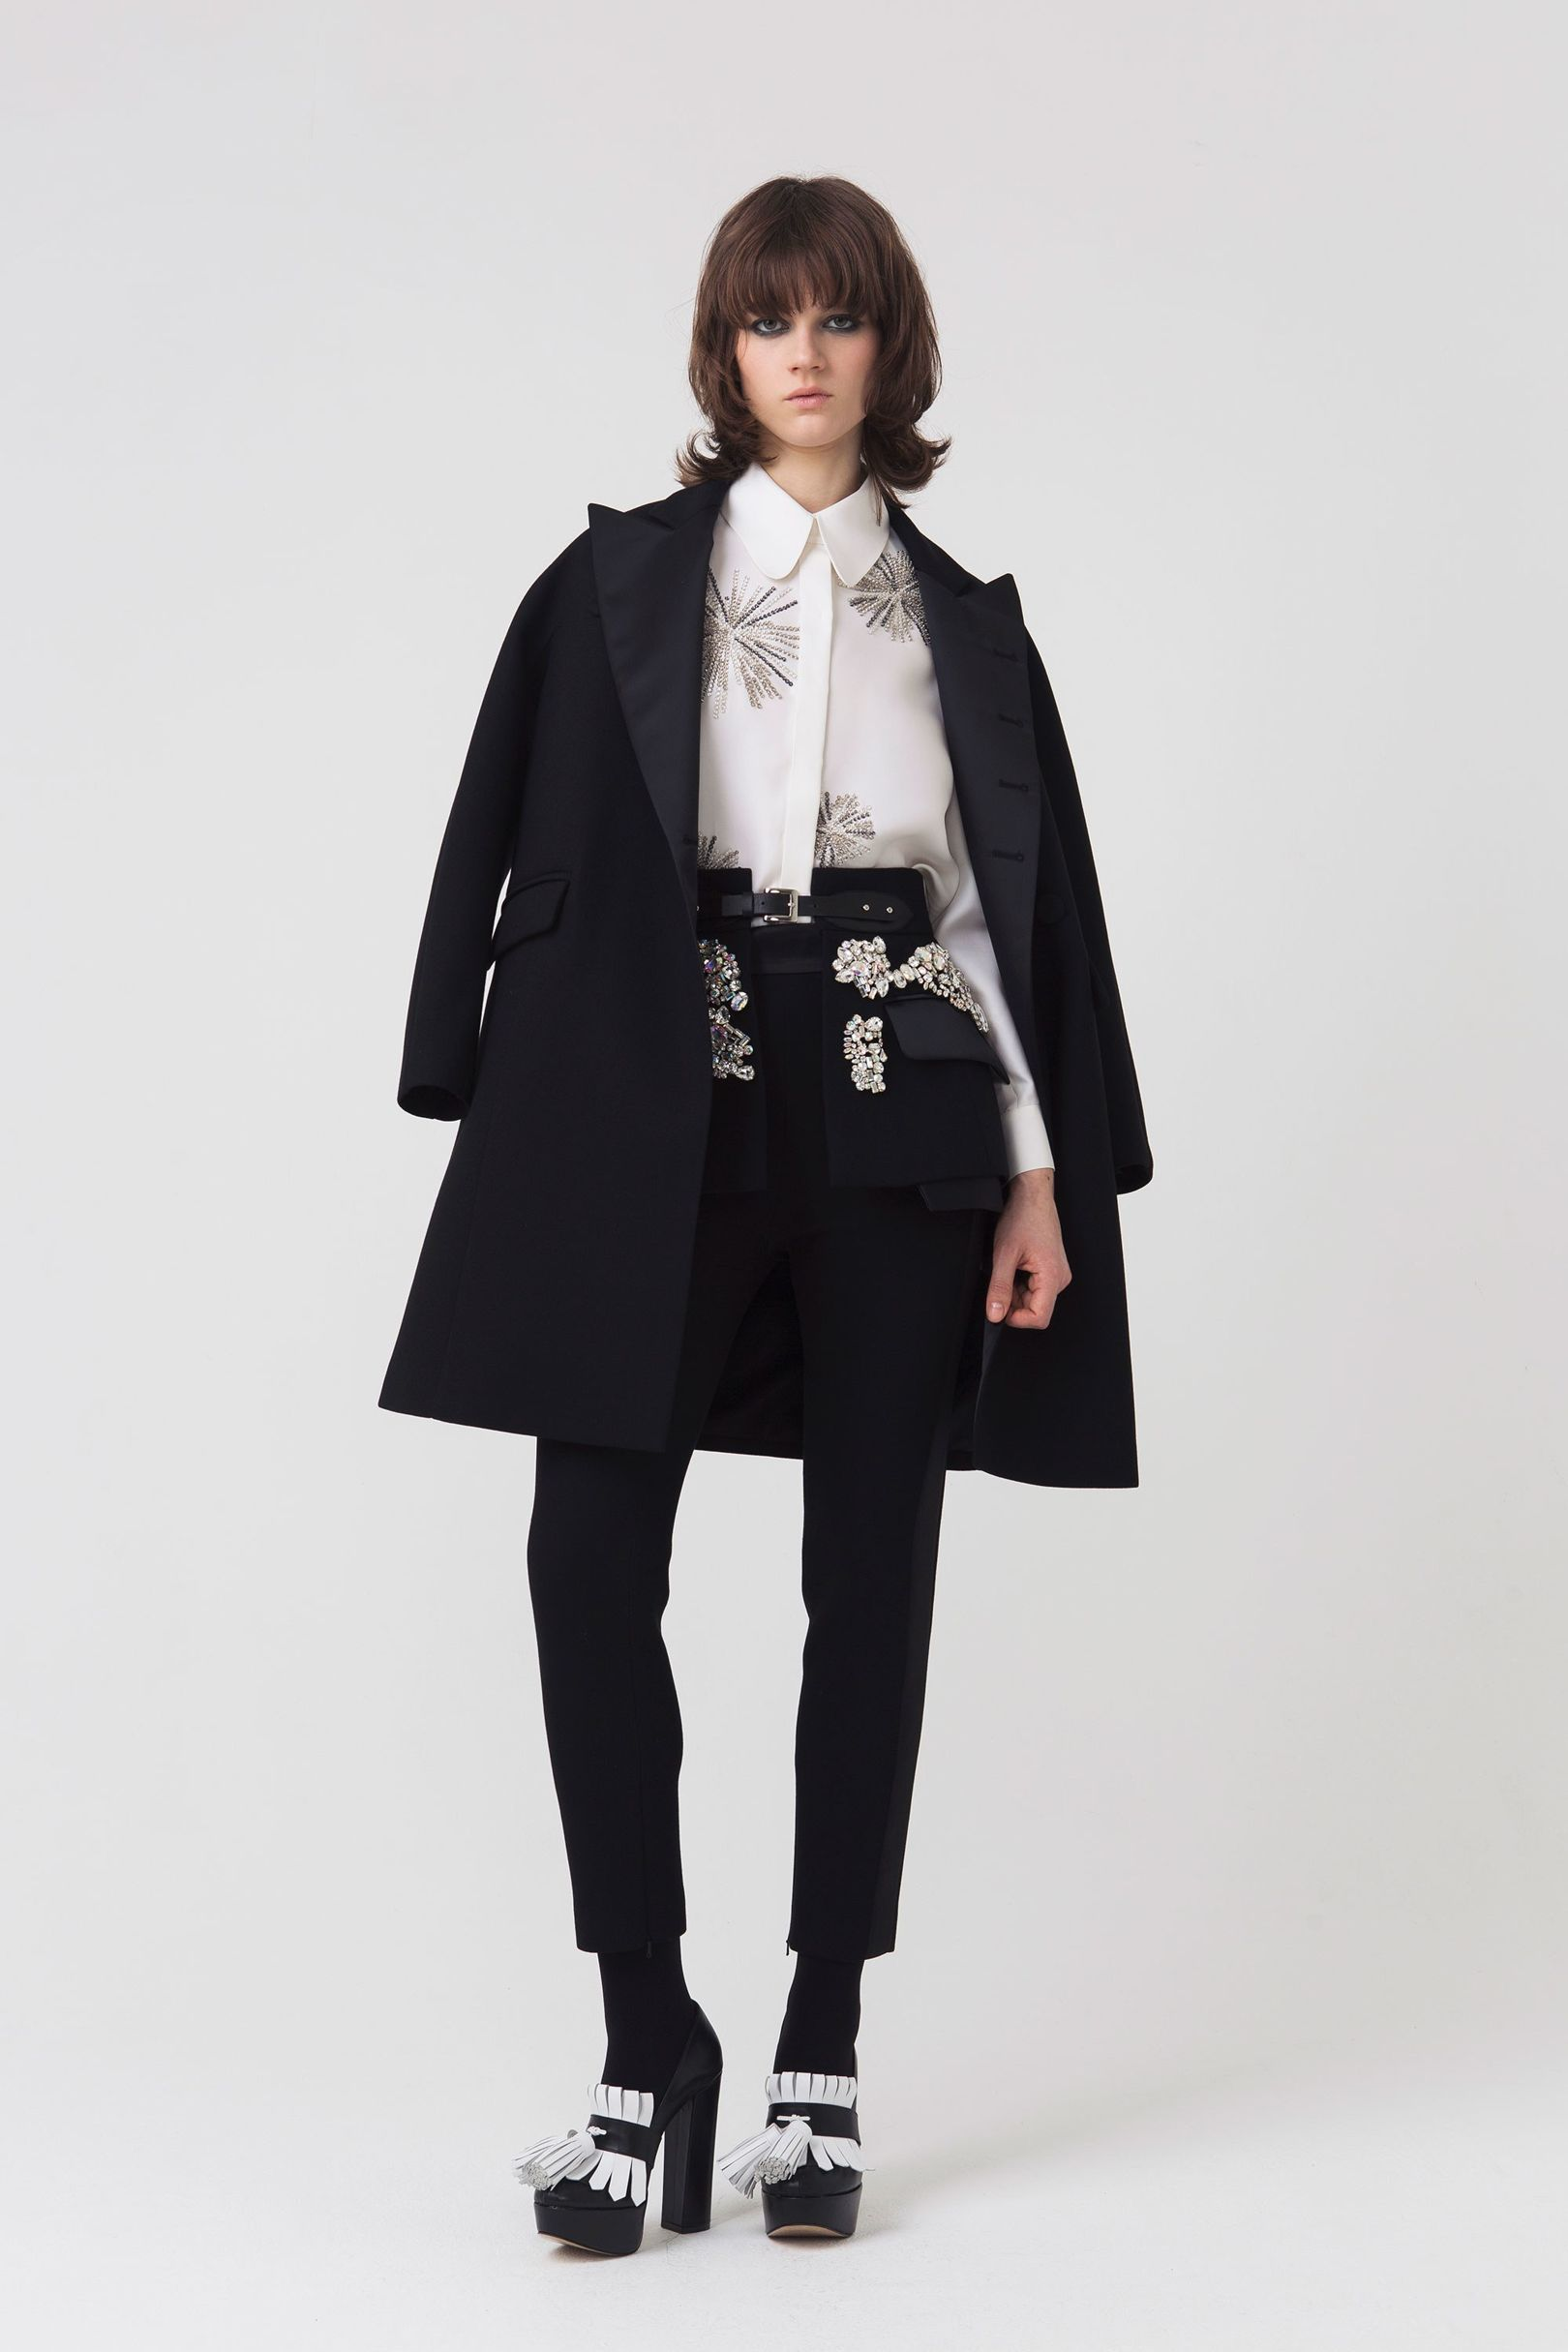 Dice Kayek Autumn/Winter 2018 Ready To Wear Модные стили